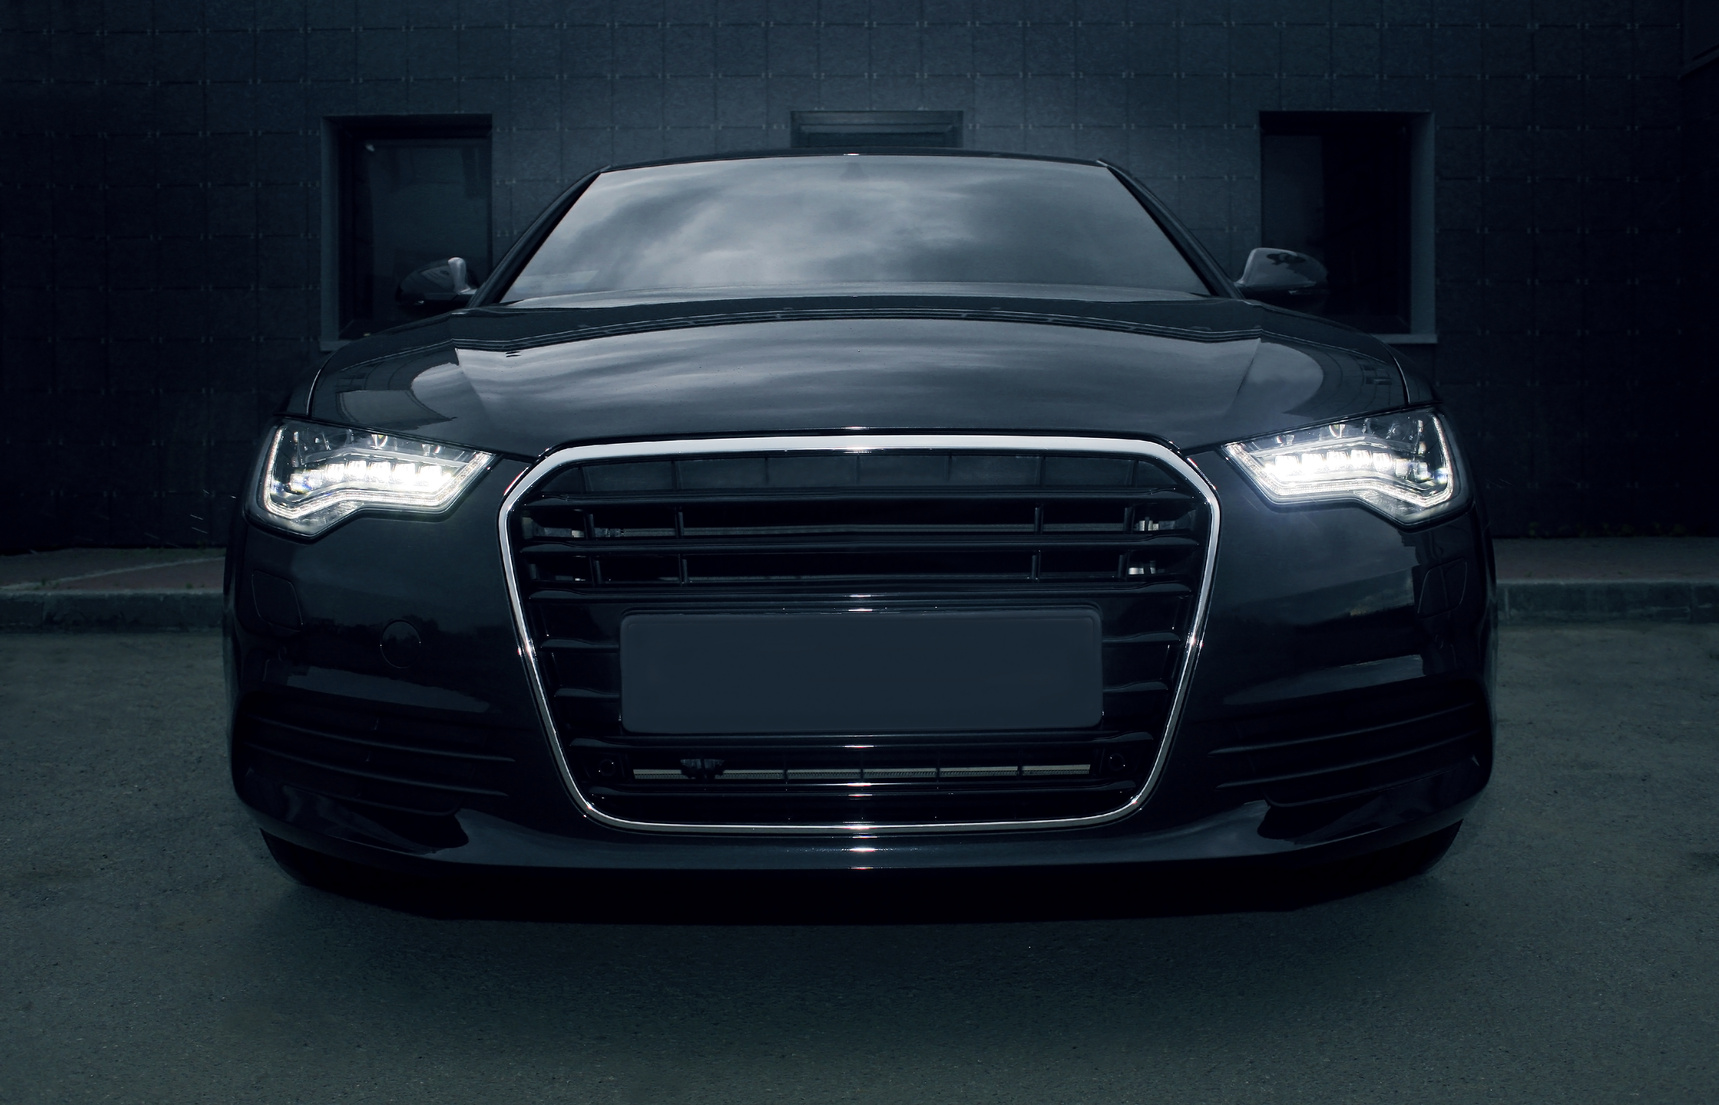 black powerful sports car